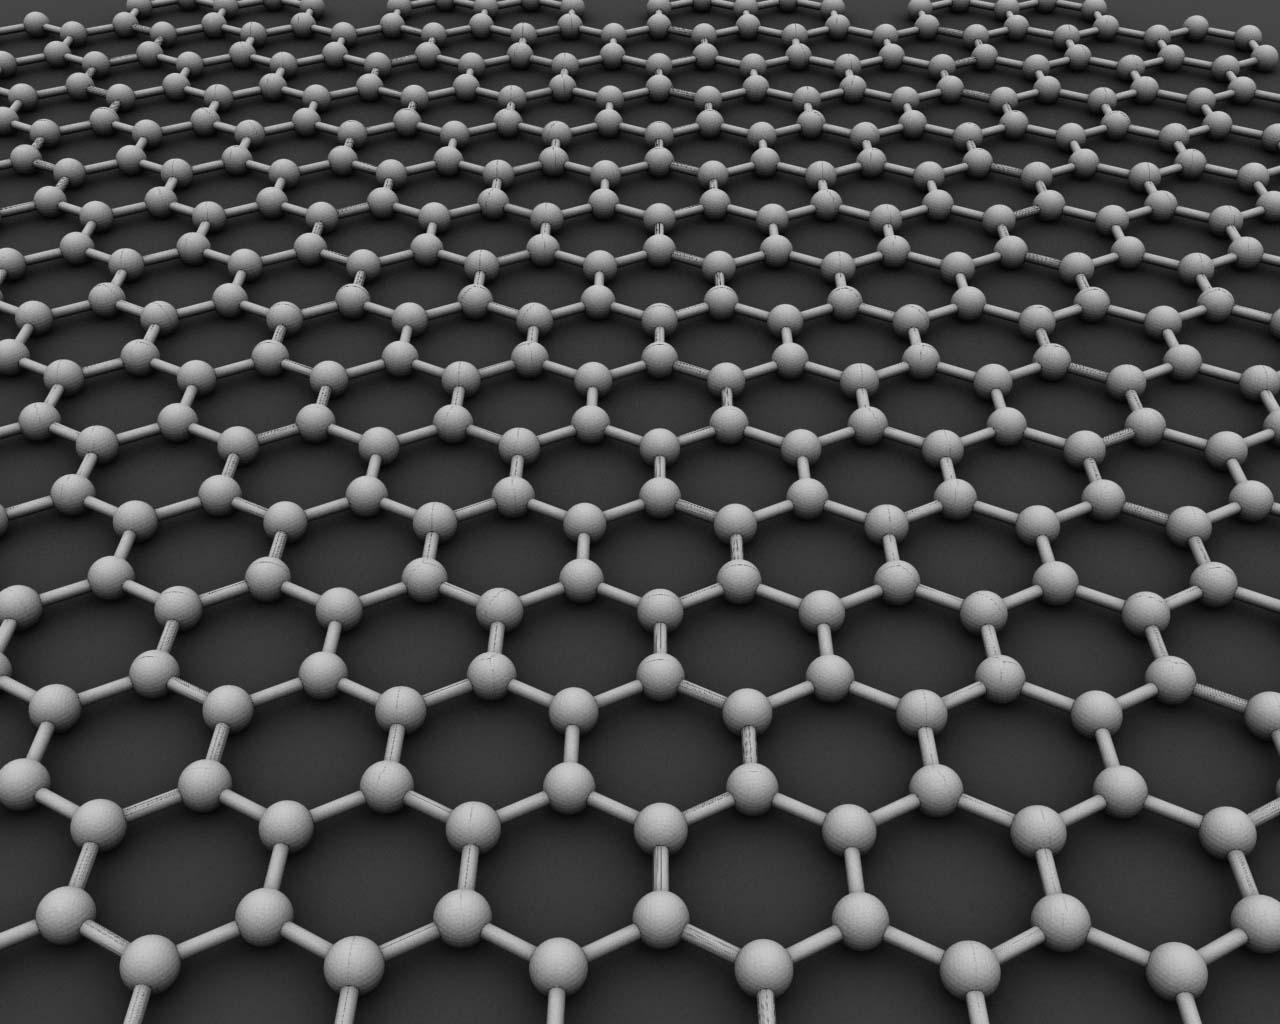 grafene scala atomica 1